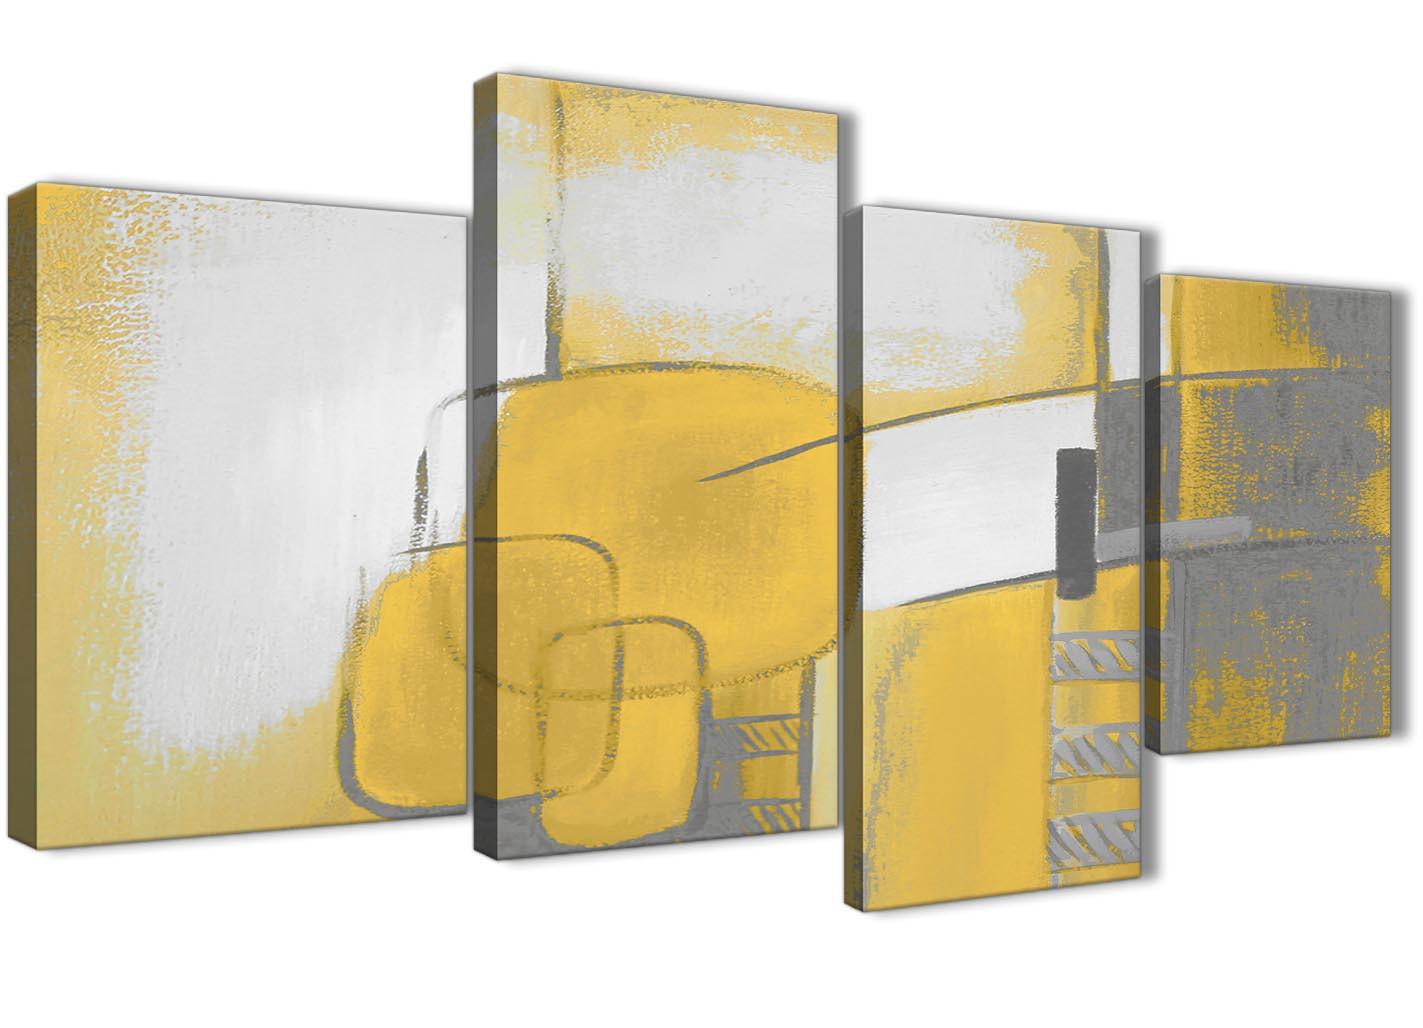 Set Of 3 Flannelette Yellow Grey Aqua Burp Cloths Toweling Backed Great Gift